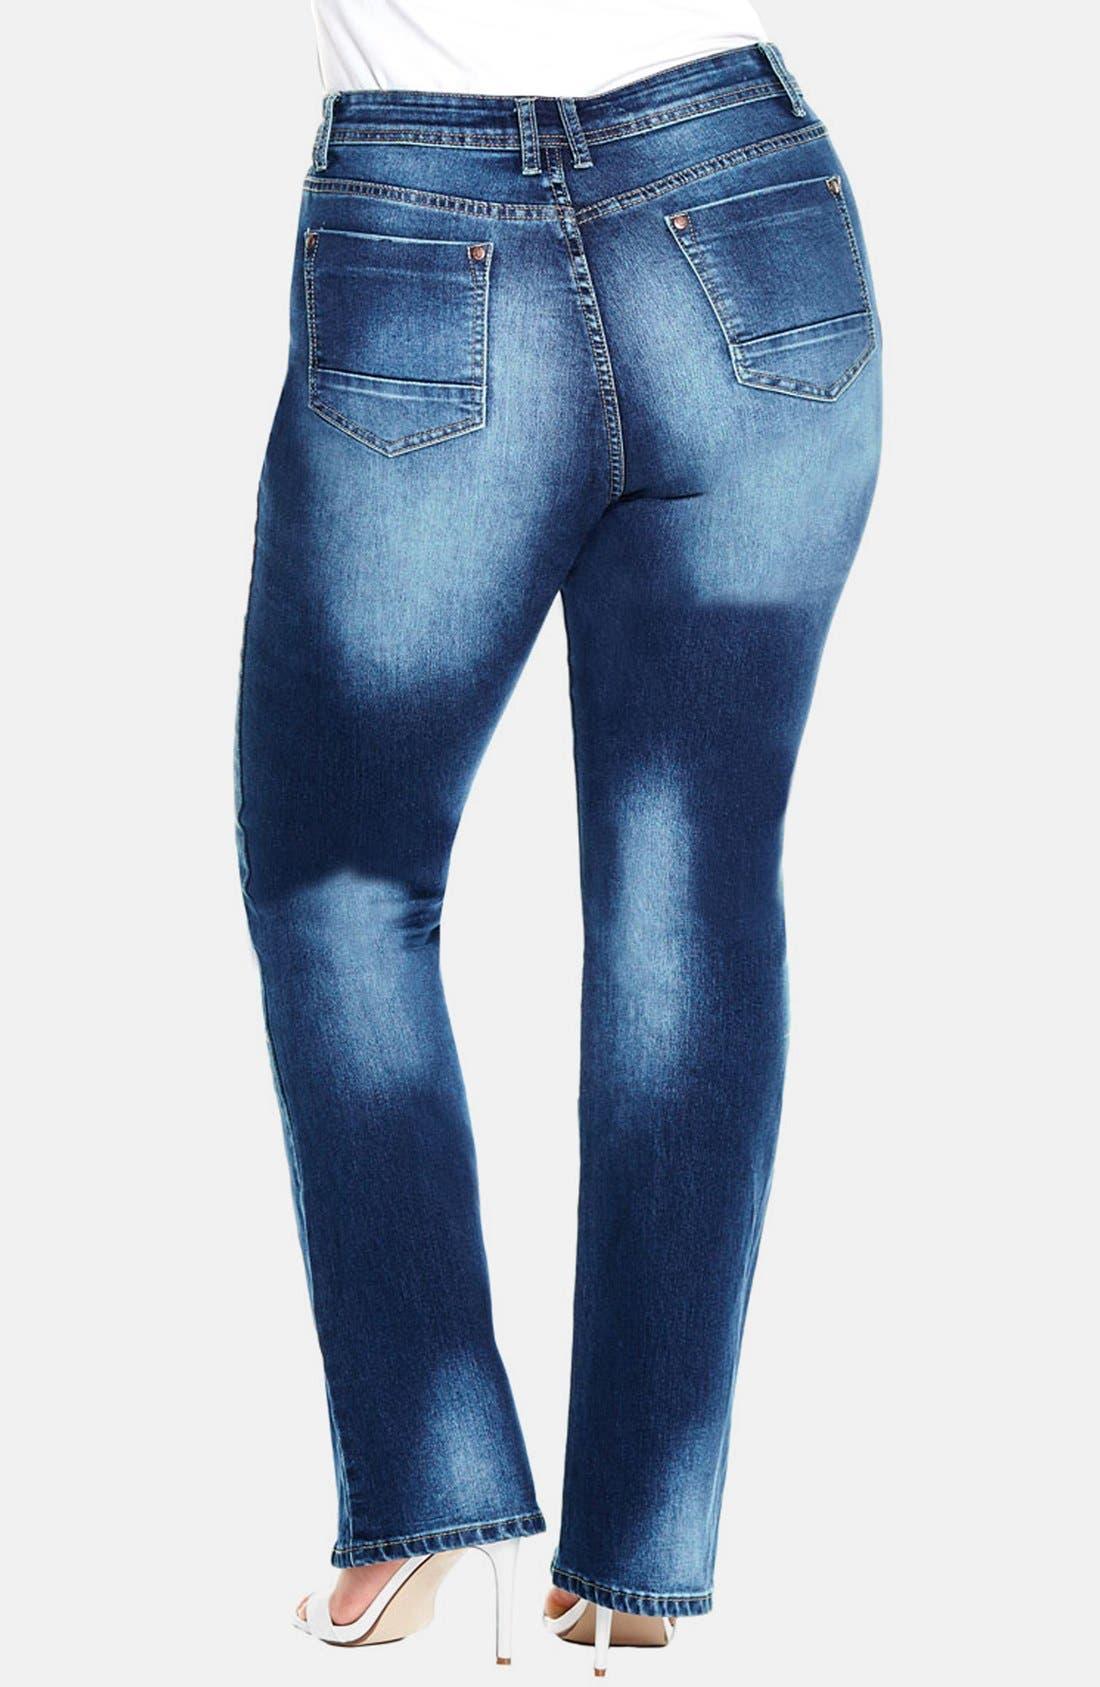 Alternate Image 2  - City Chic 'Clean Cut' Stretch Bootcut Jeans (Mid Denim) (Plus Size)